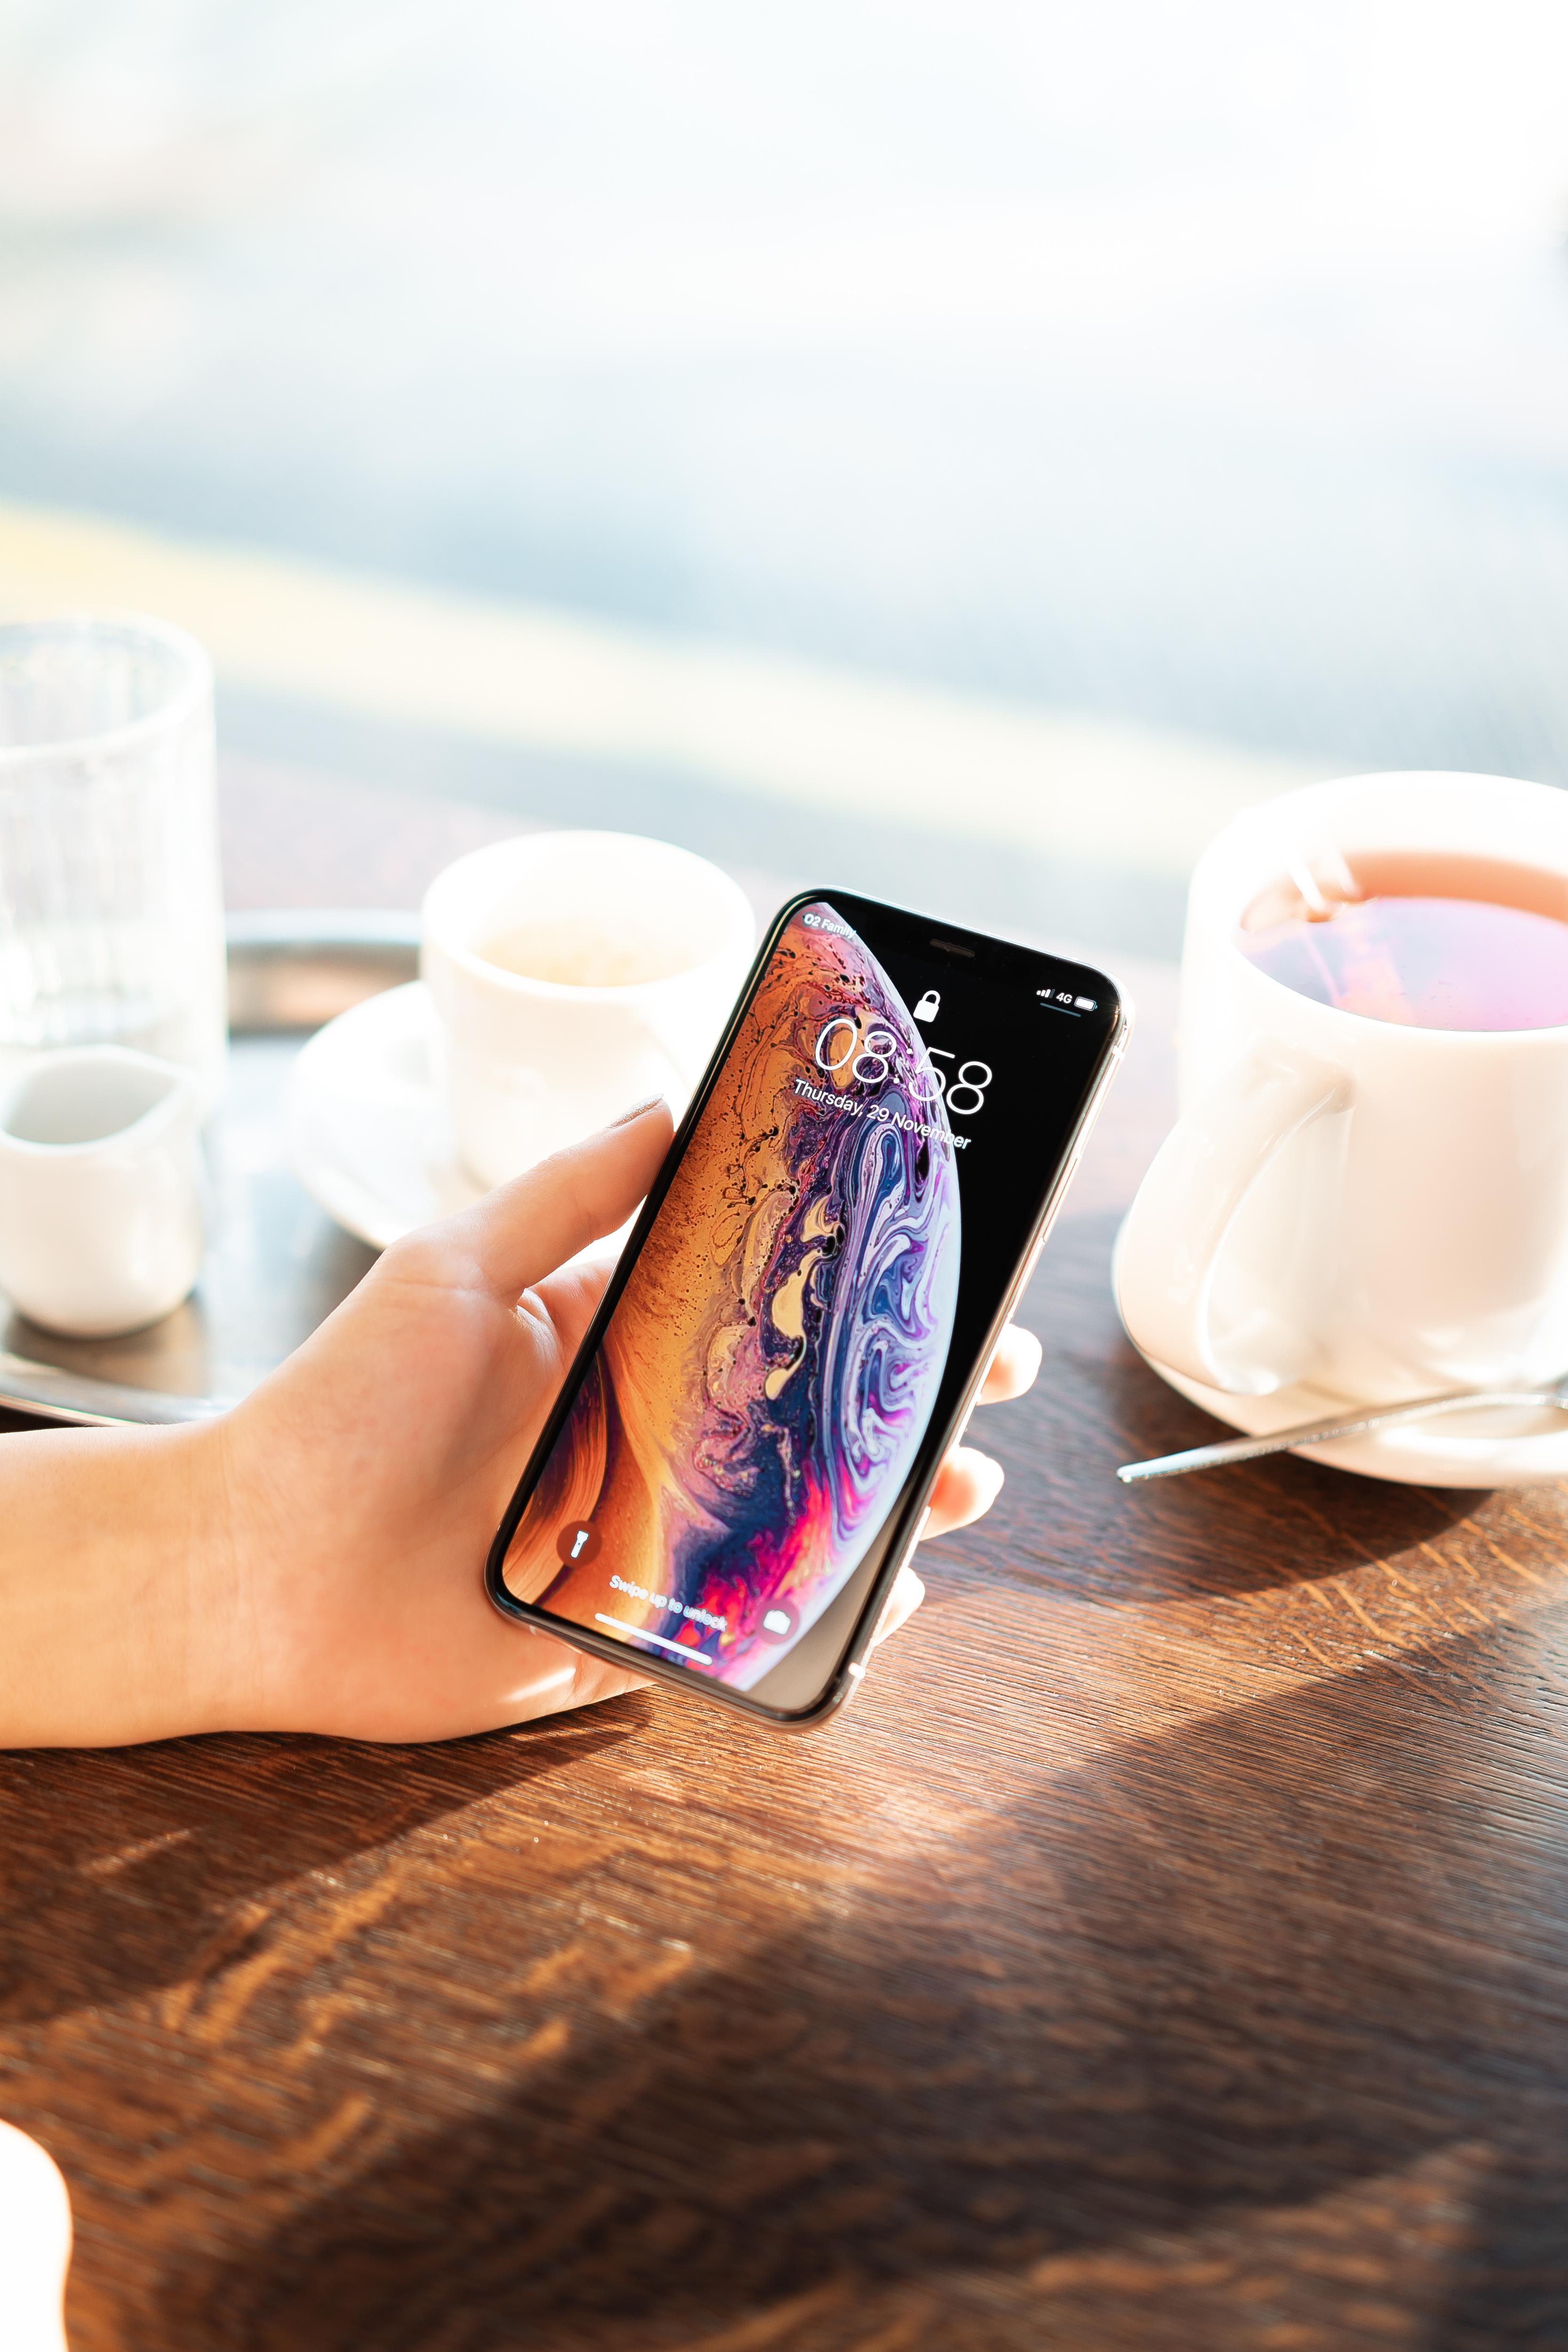 Showing An Iphone Xs In Café Free Stock Photo Picjumbo